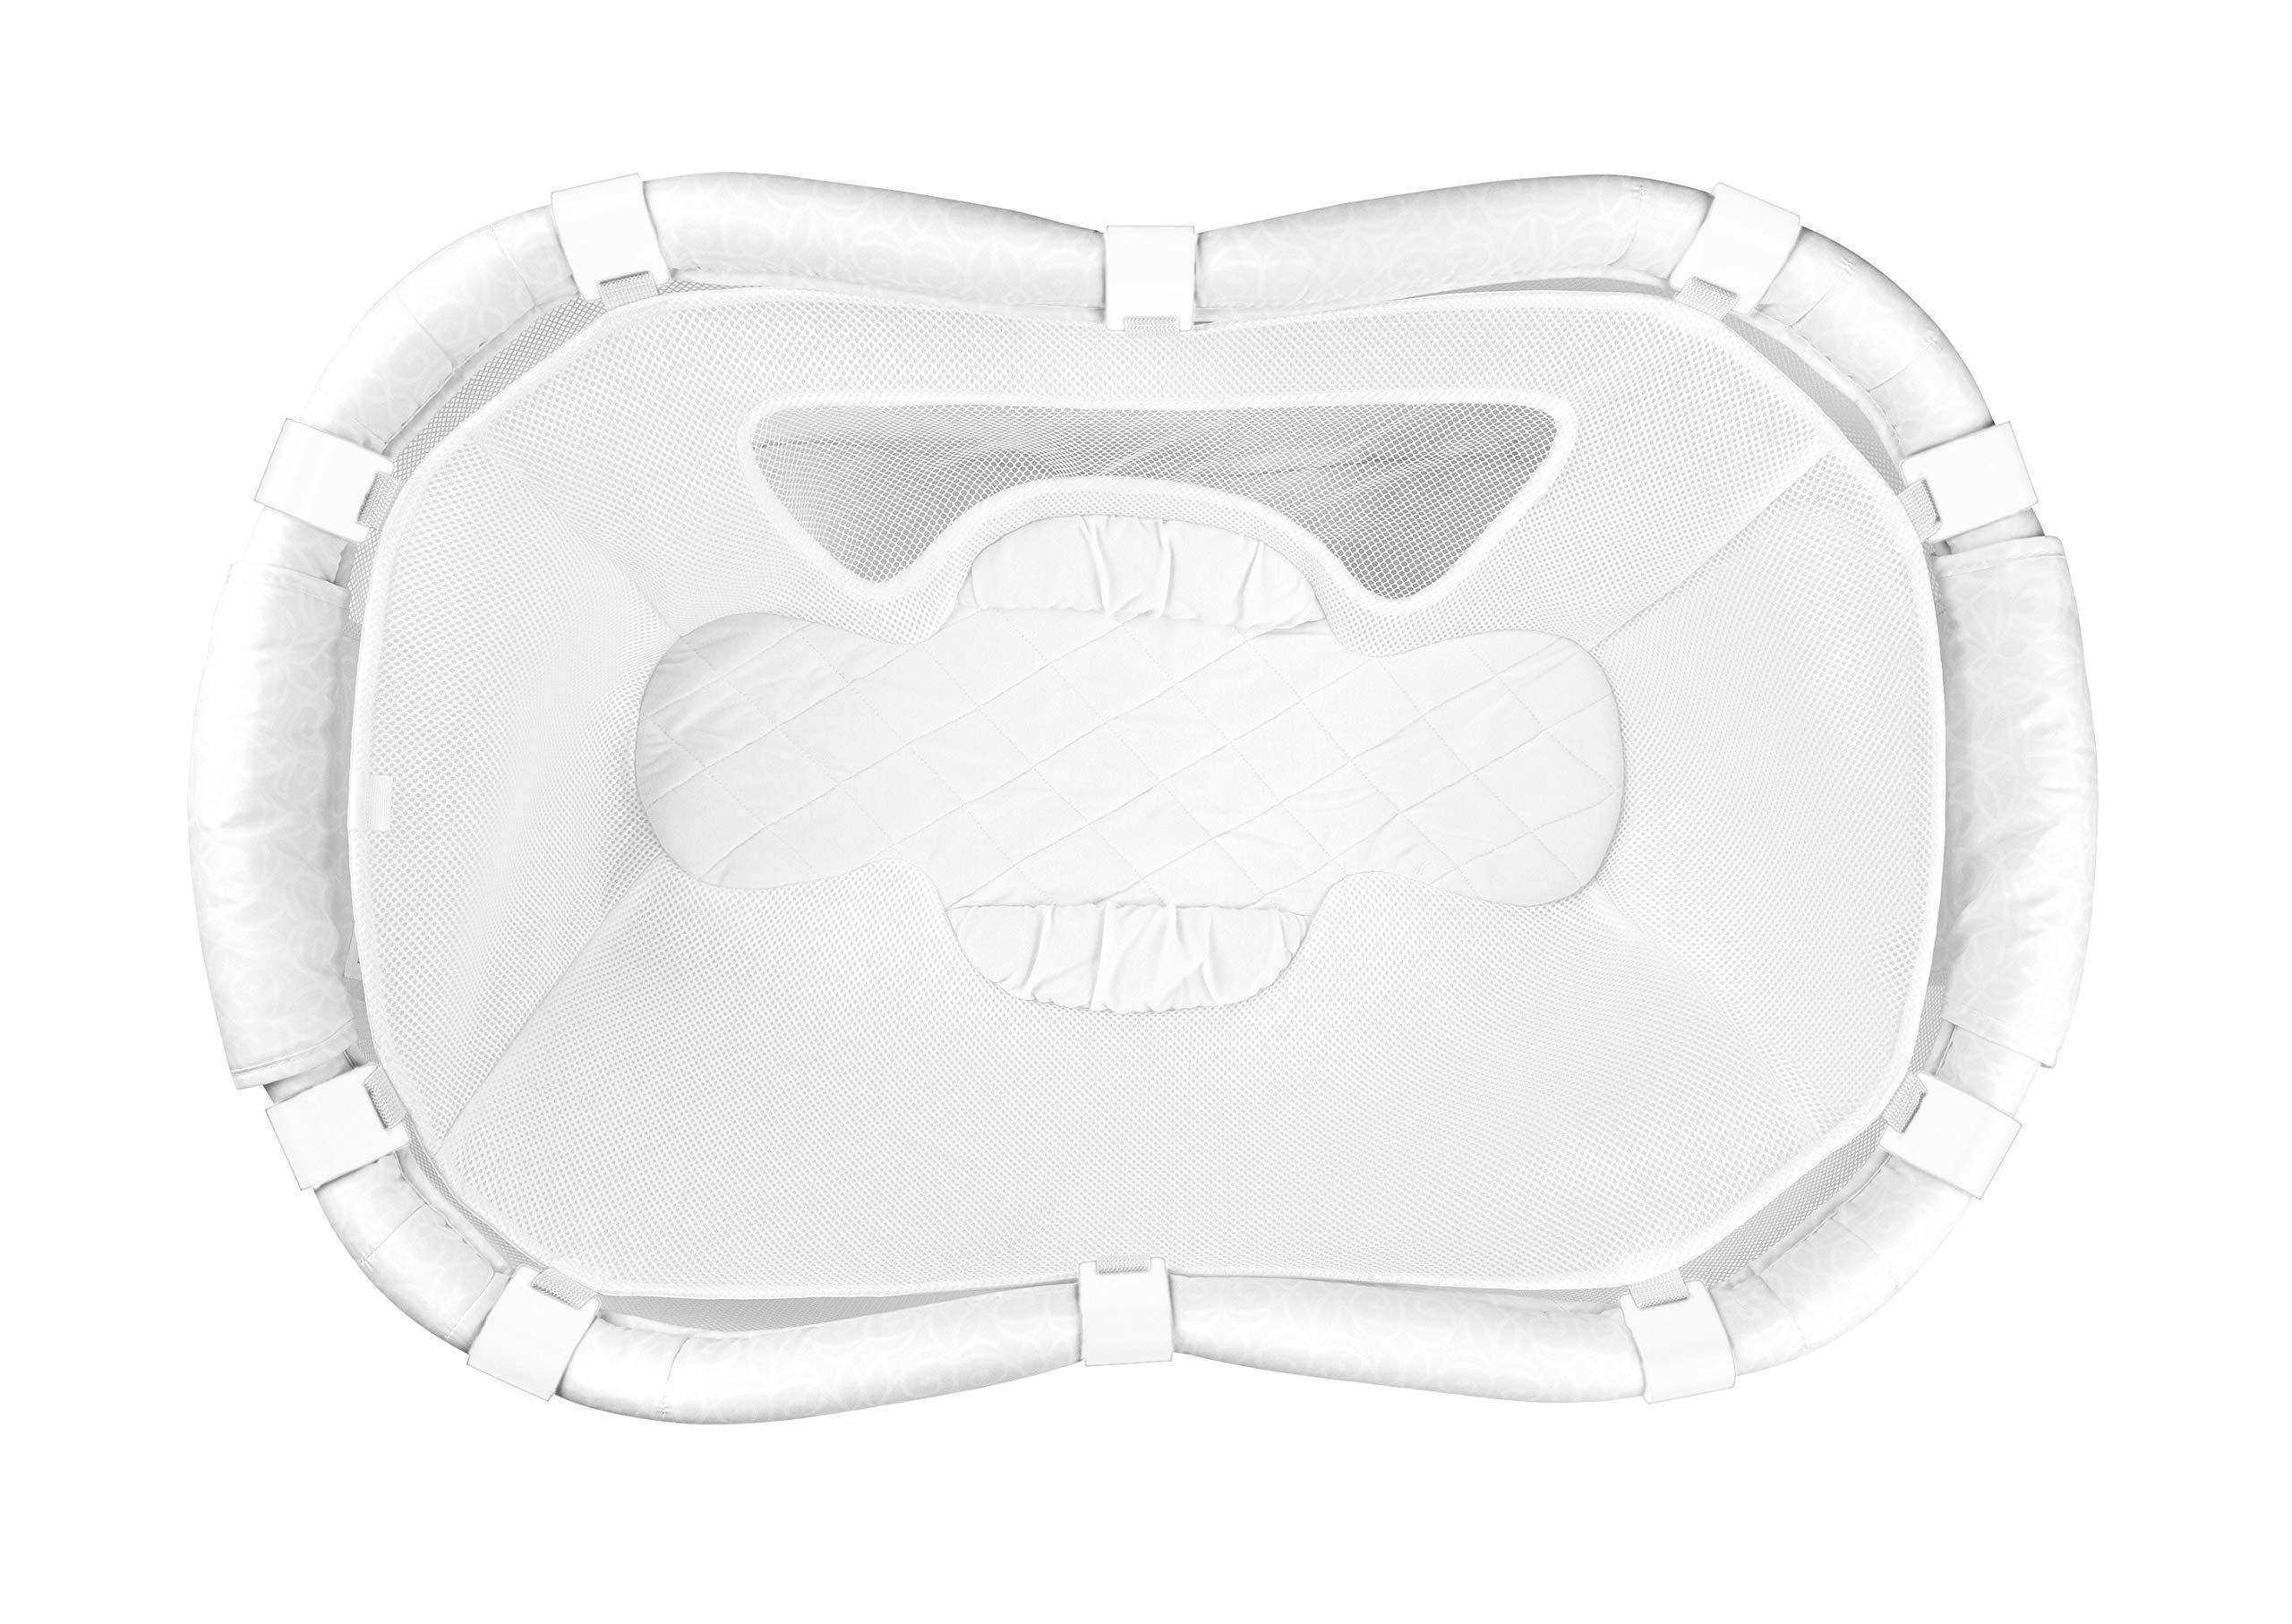 MySnuggly Newborn Bassinet Insert for Halo Bassinets   Real Cuddling Feeling & Better Sleep   Anatomical Hypoallergenic Baby Insert w/Breathable Mesh   Patent Pending